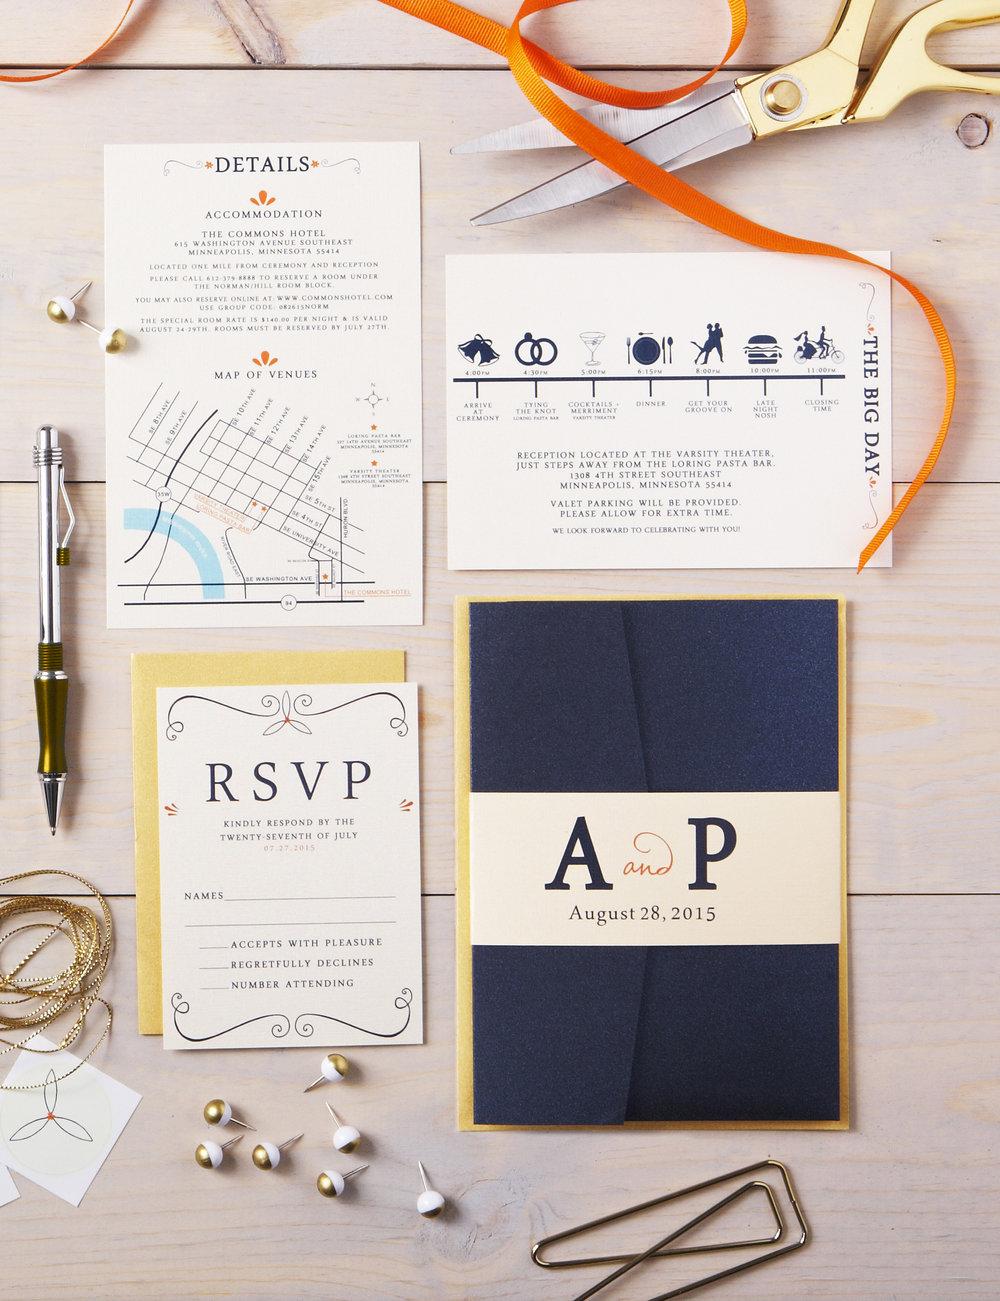 Angie_custom_wedding_invitation_huntwrightdesignco_007.jpg